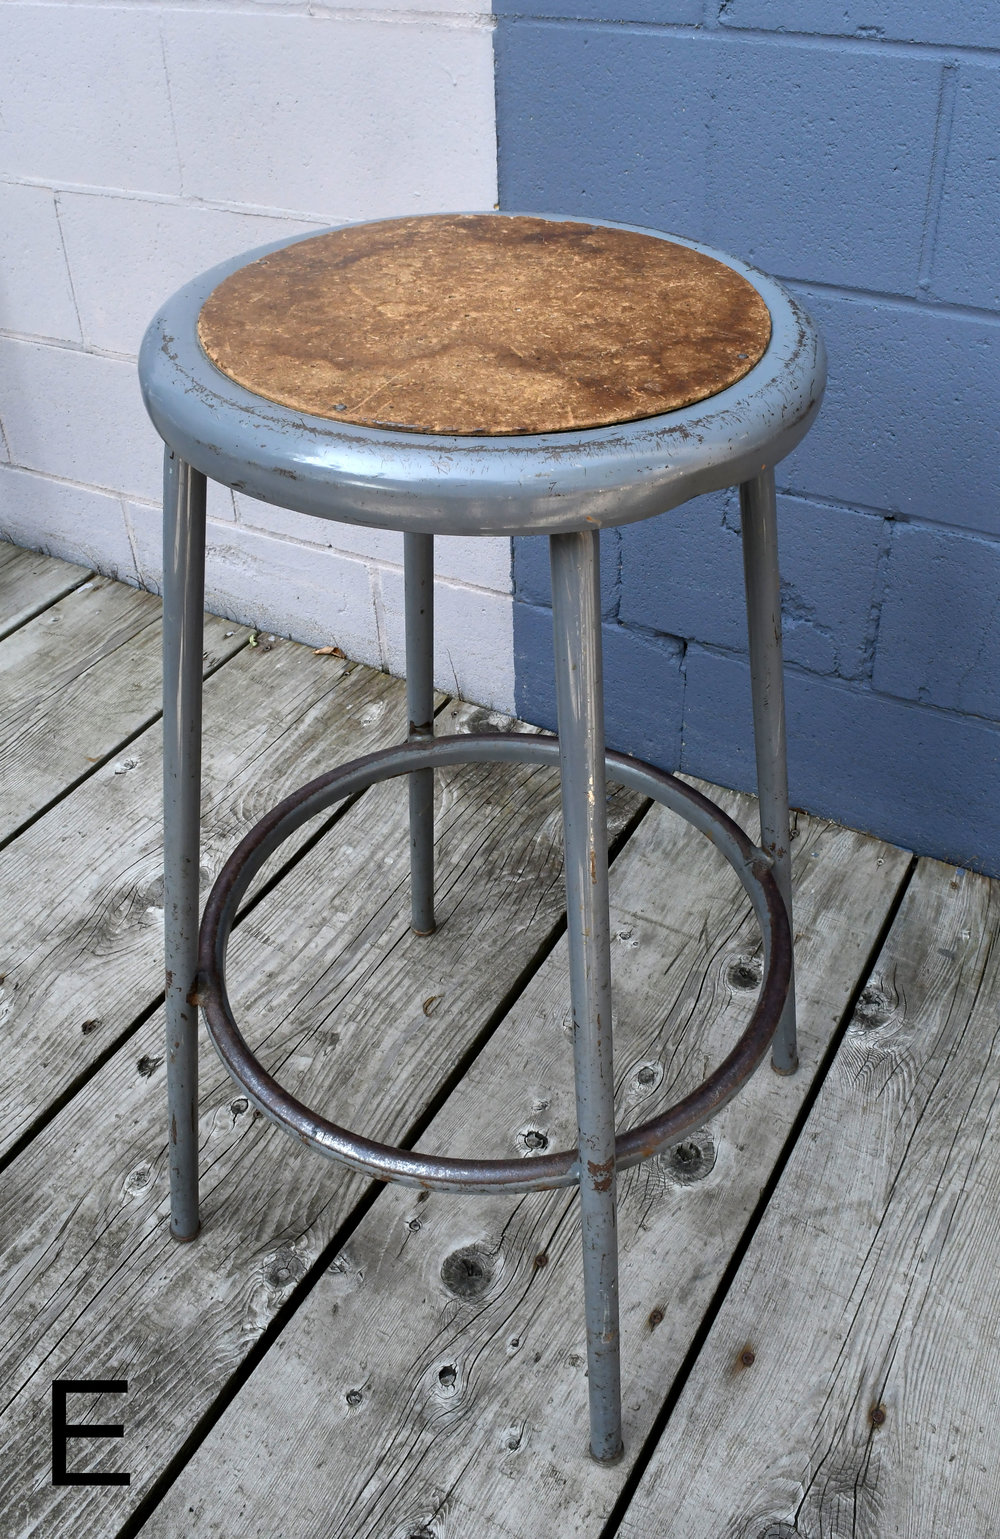 47340-art-school-stools-variation-E-with-letter.jpg